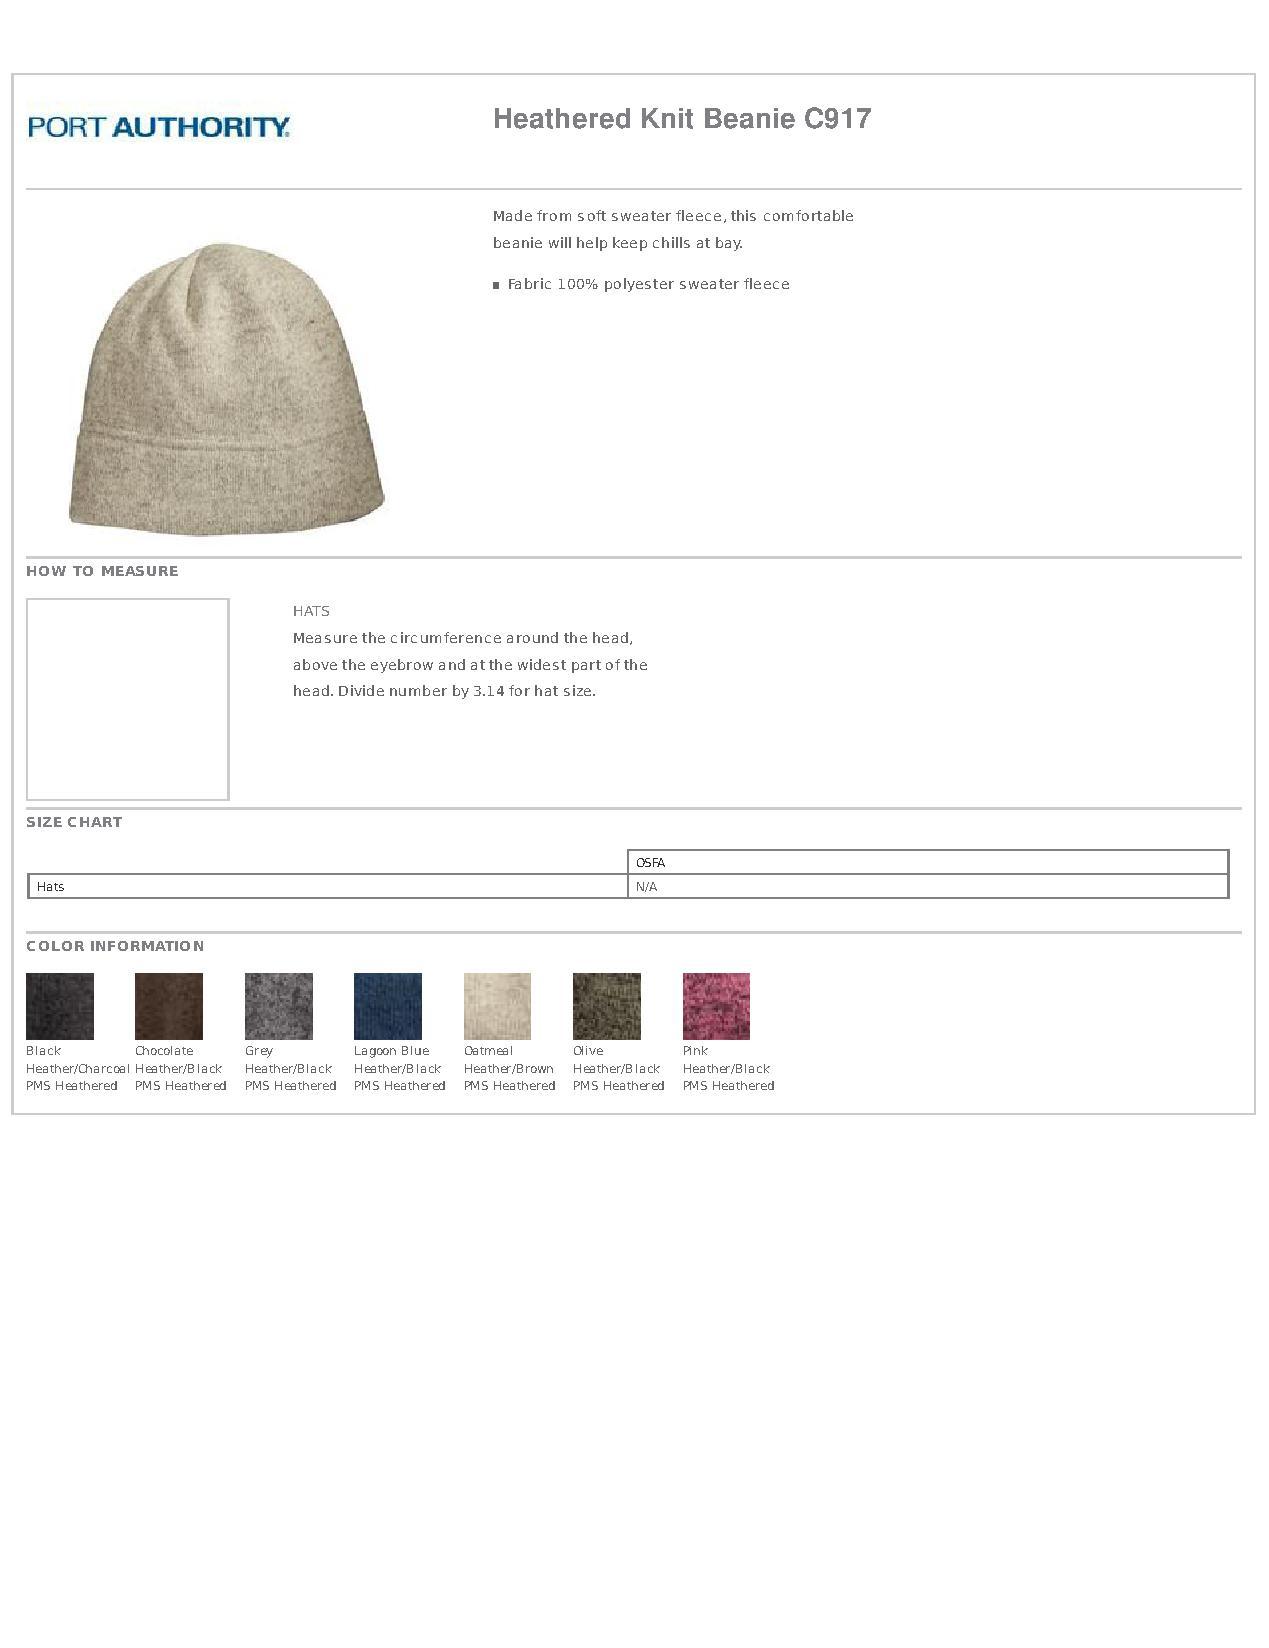 4112f84c0e4 Port Authority® C917 Heathered Knit Beanie - Headwear